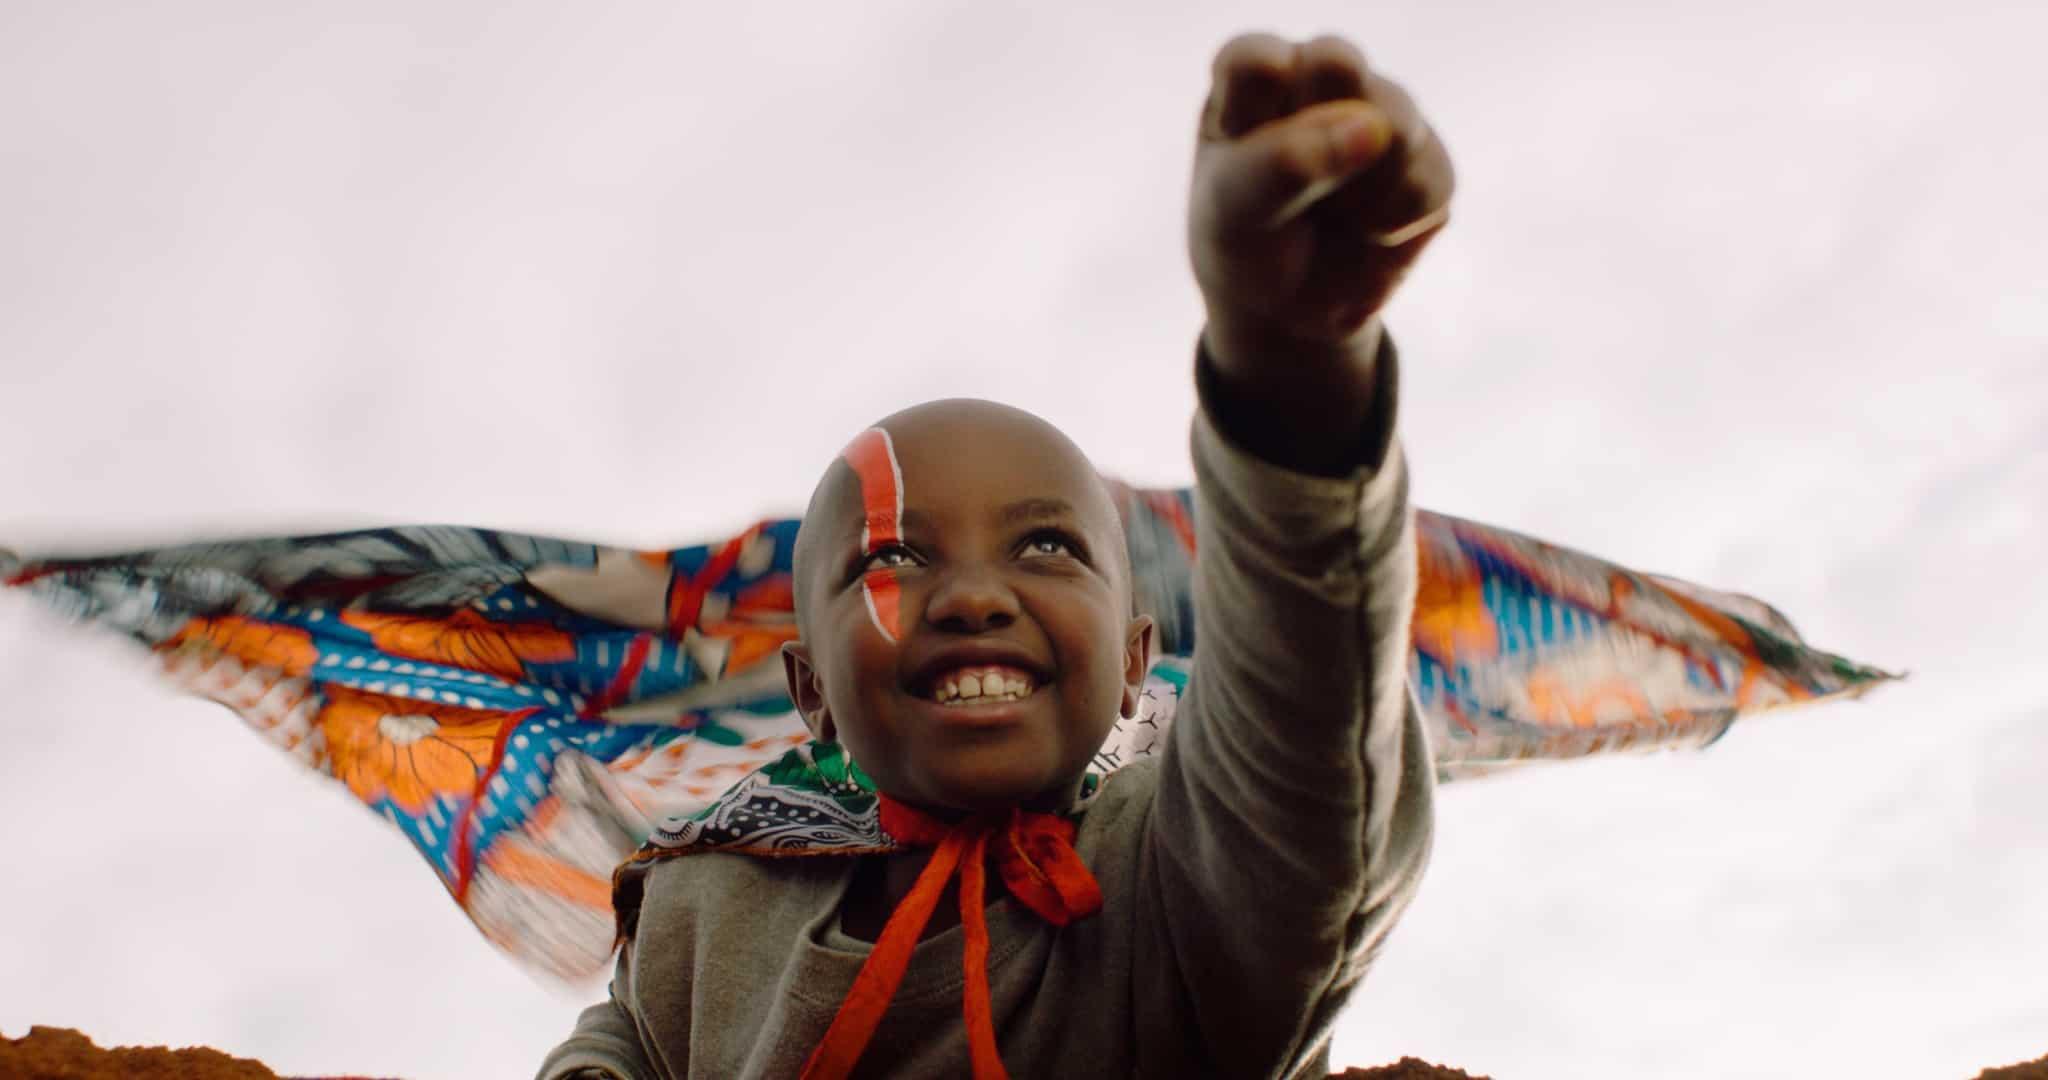 Supa Modo 2018 de Likarion Wainaina Quenia 01 cred One Fine Day Films